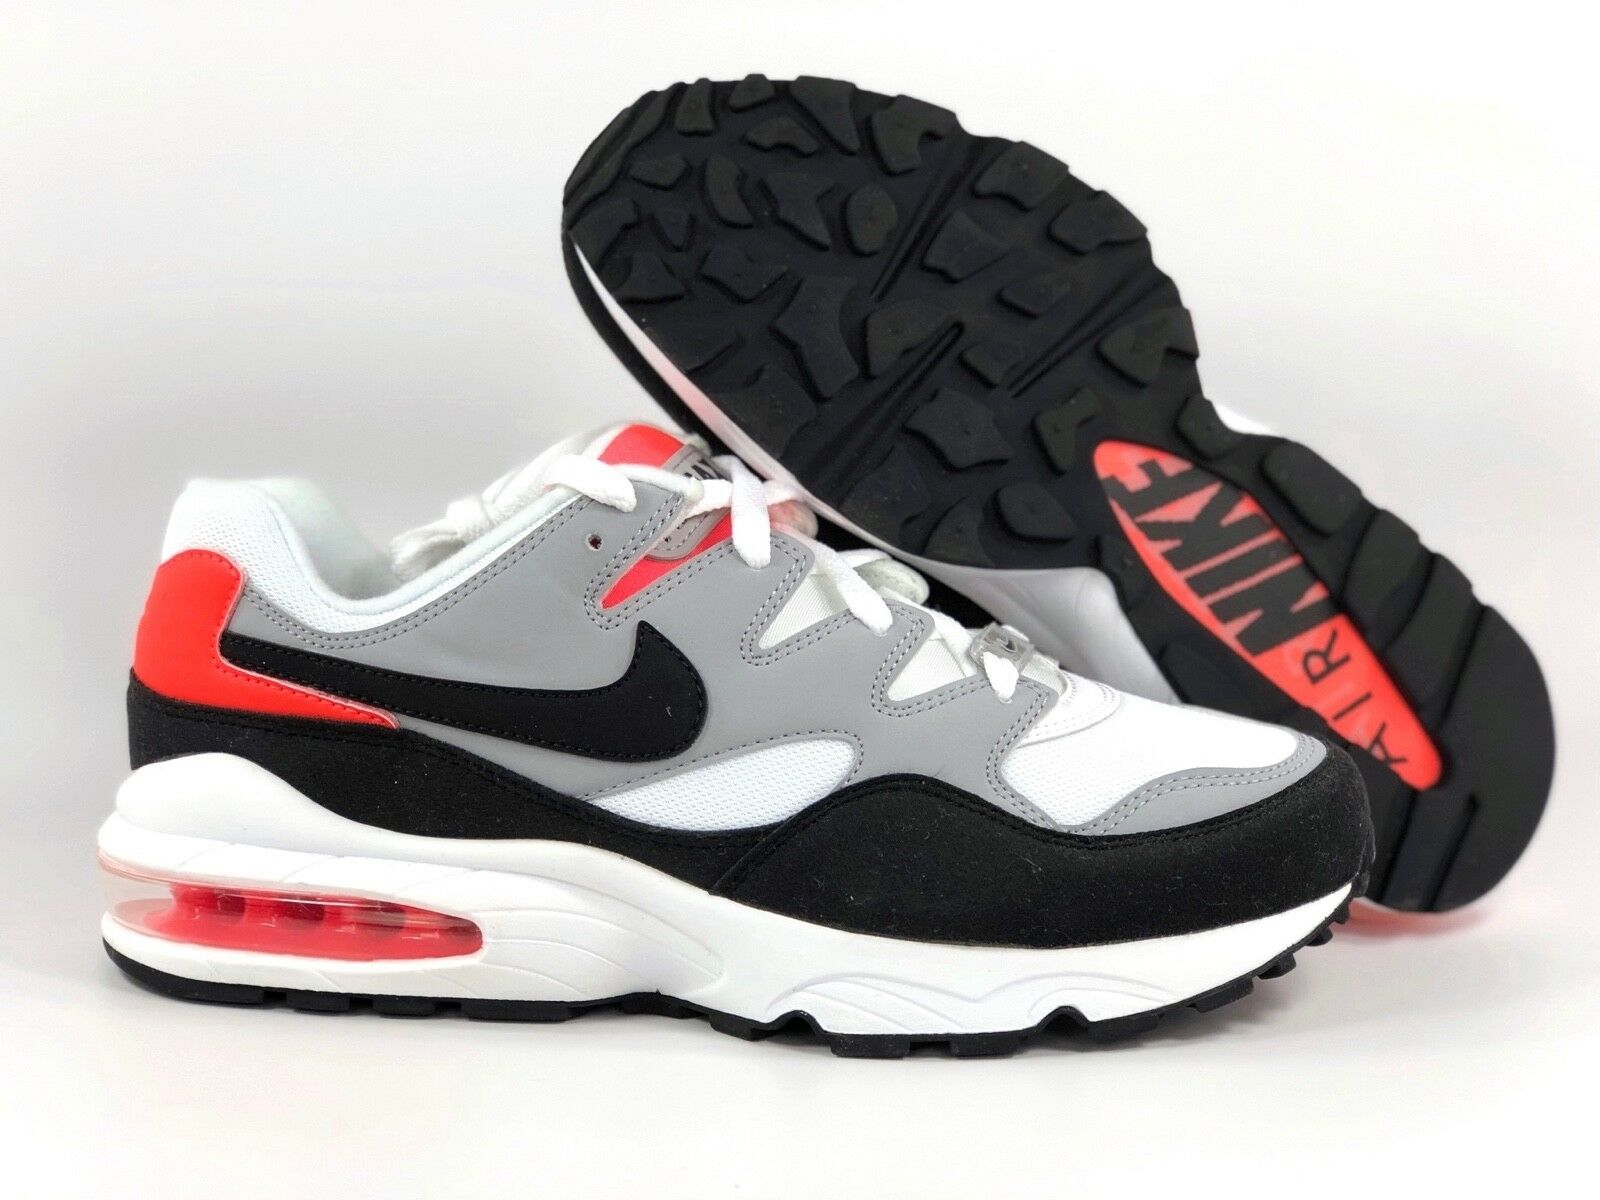 Nike Air Max 94 Wolf Grey Black White Red 747997-006 Men's 9